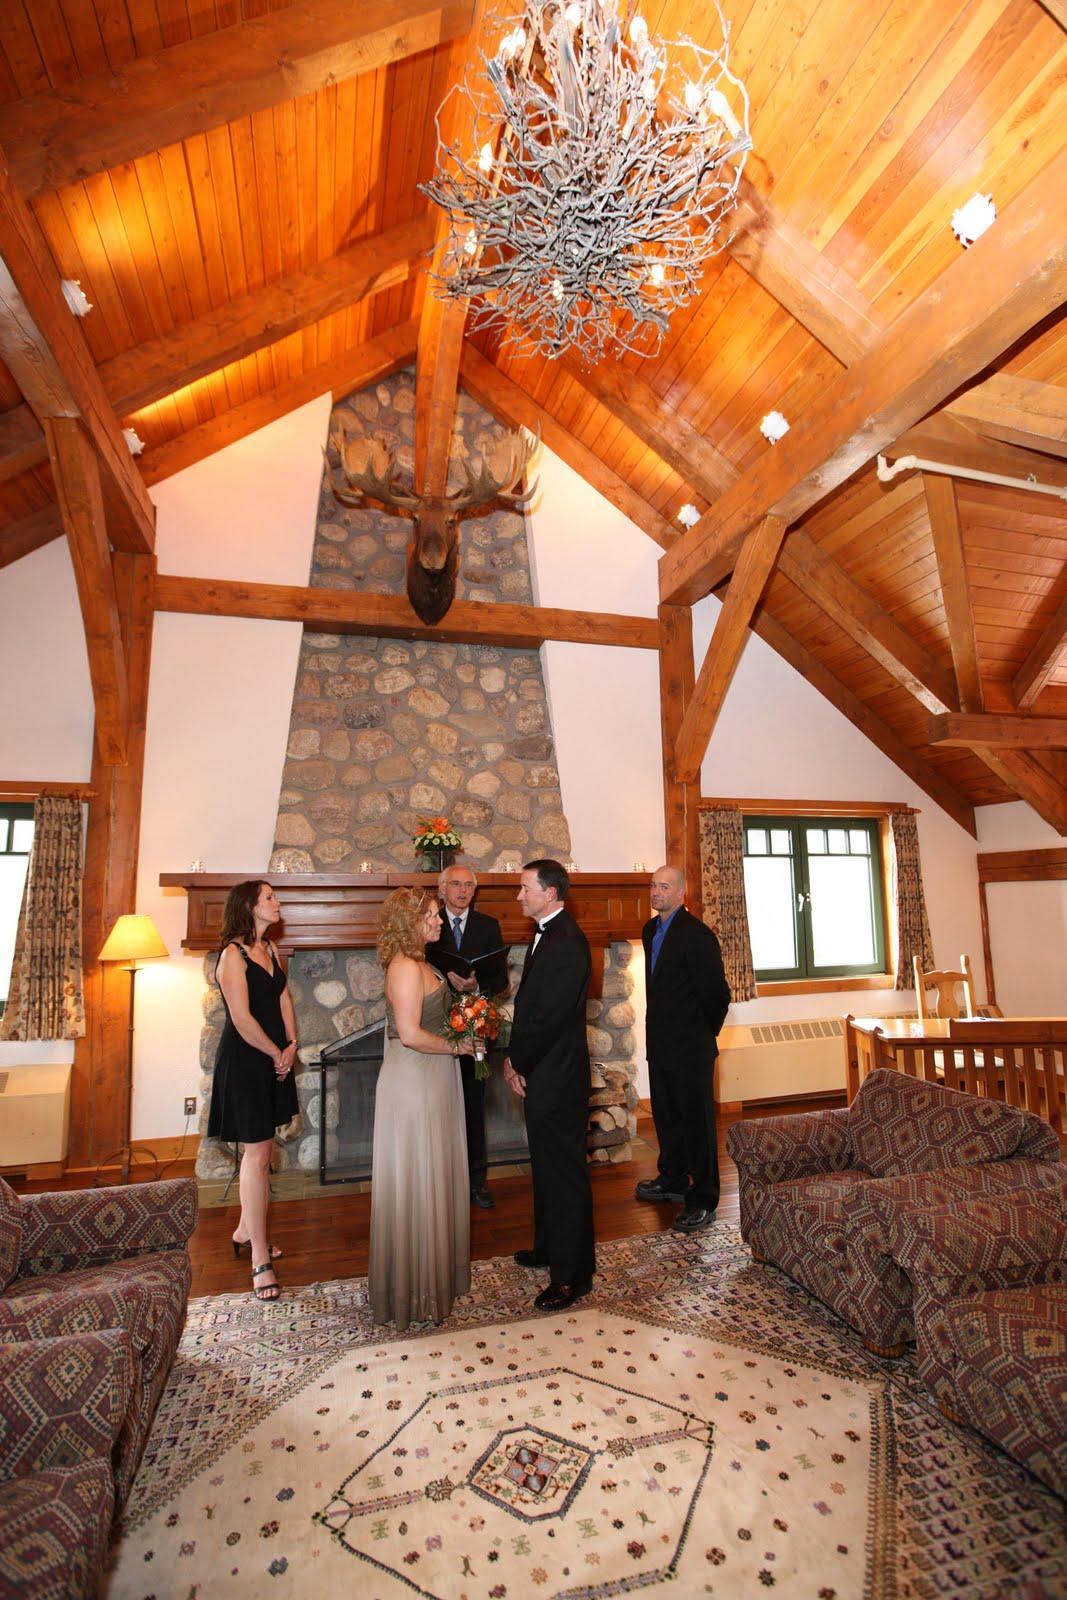 We Always Enjoy Shooting Weddings At The Post Hotel In Lake Louise